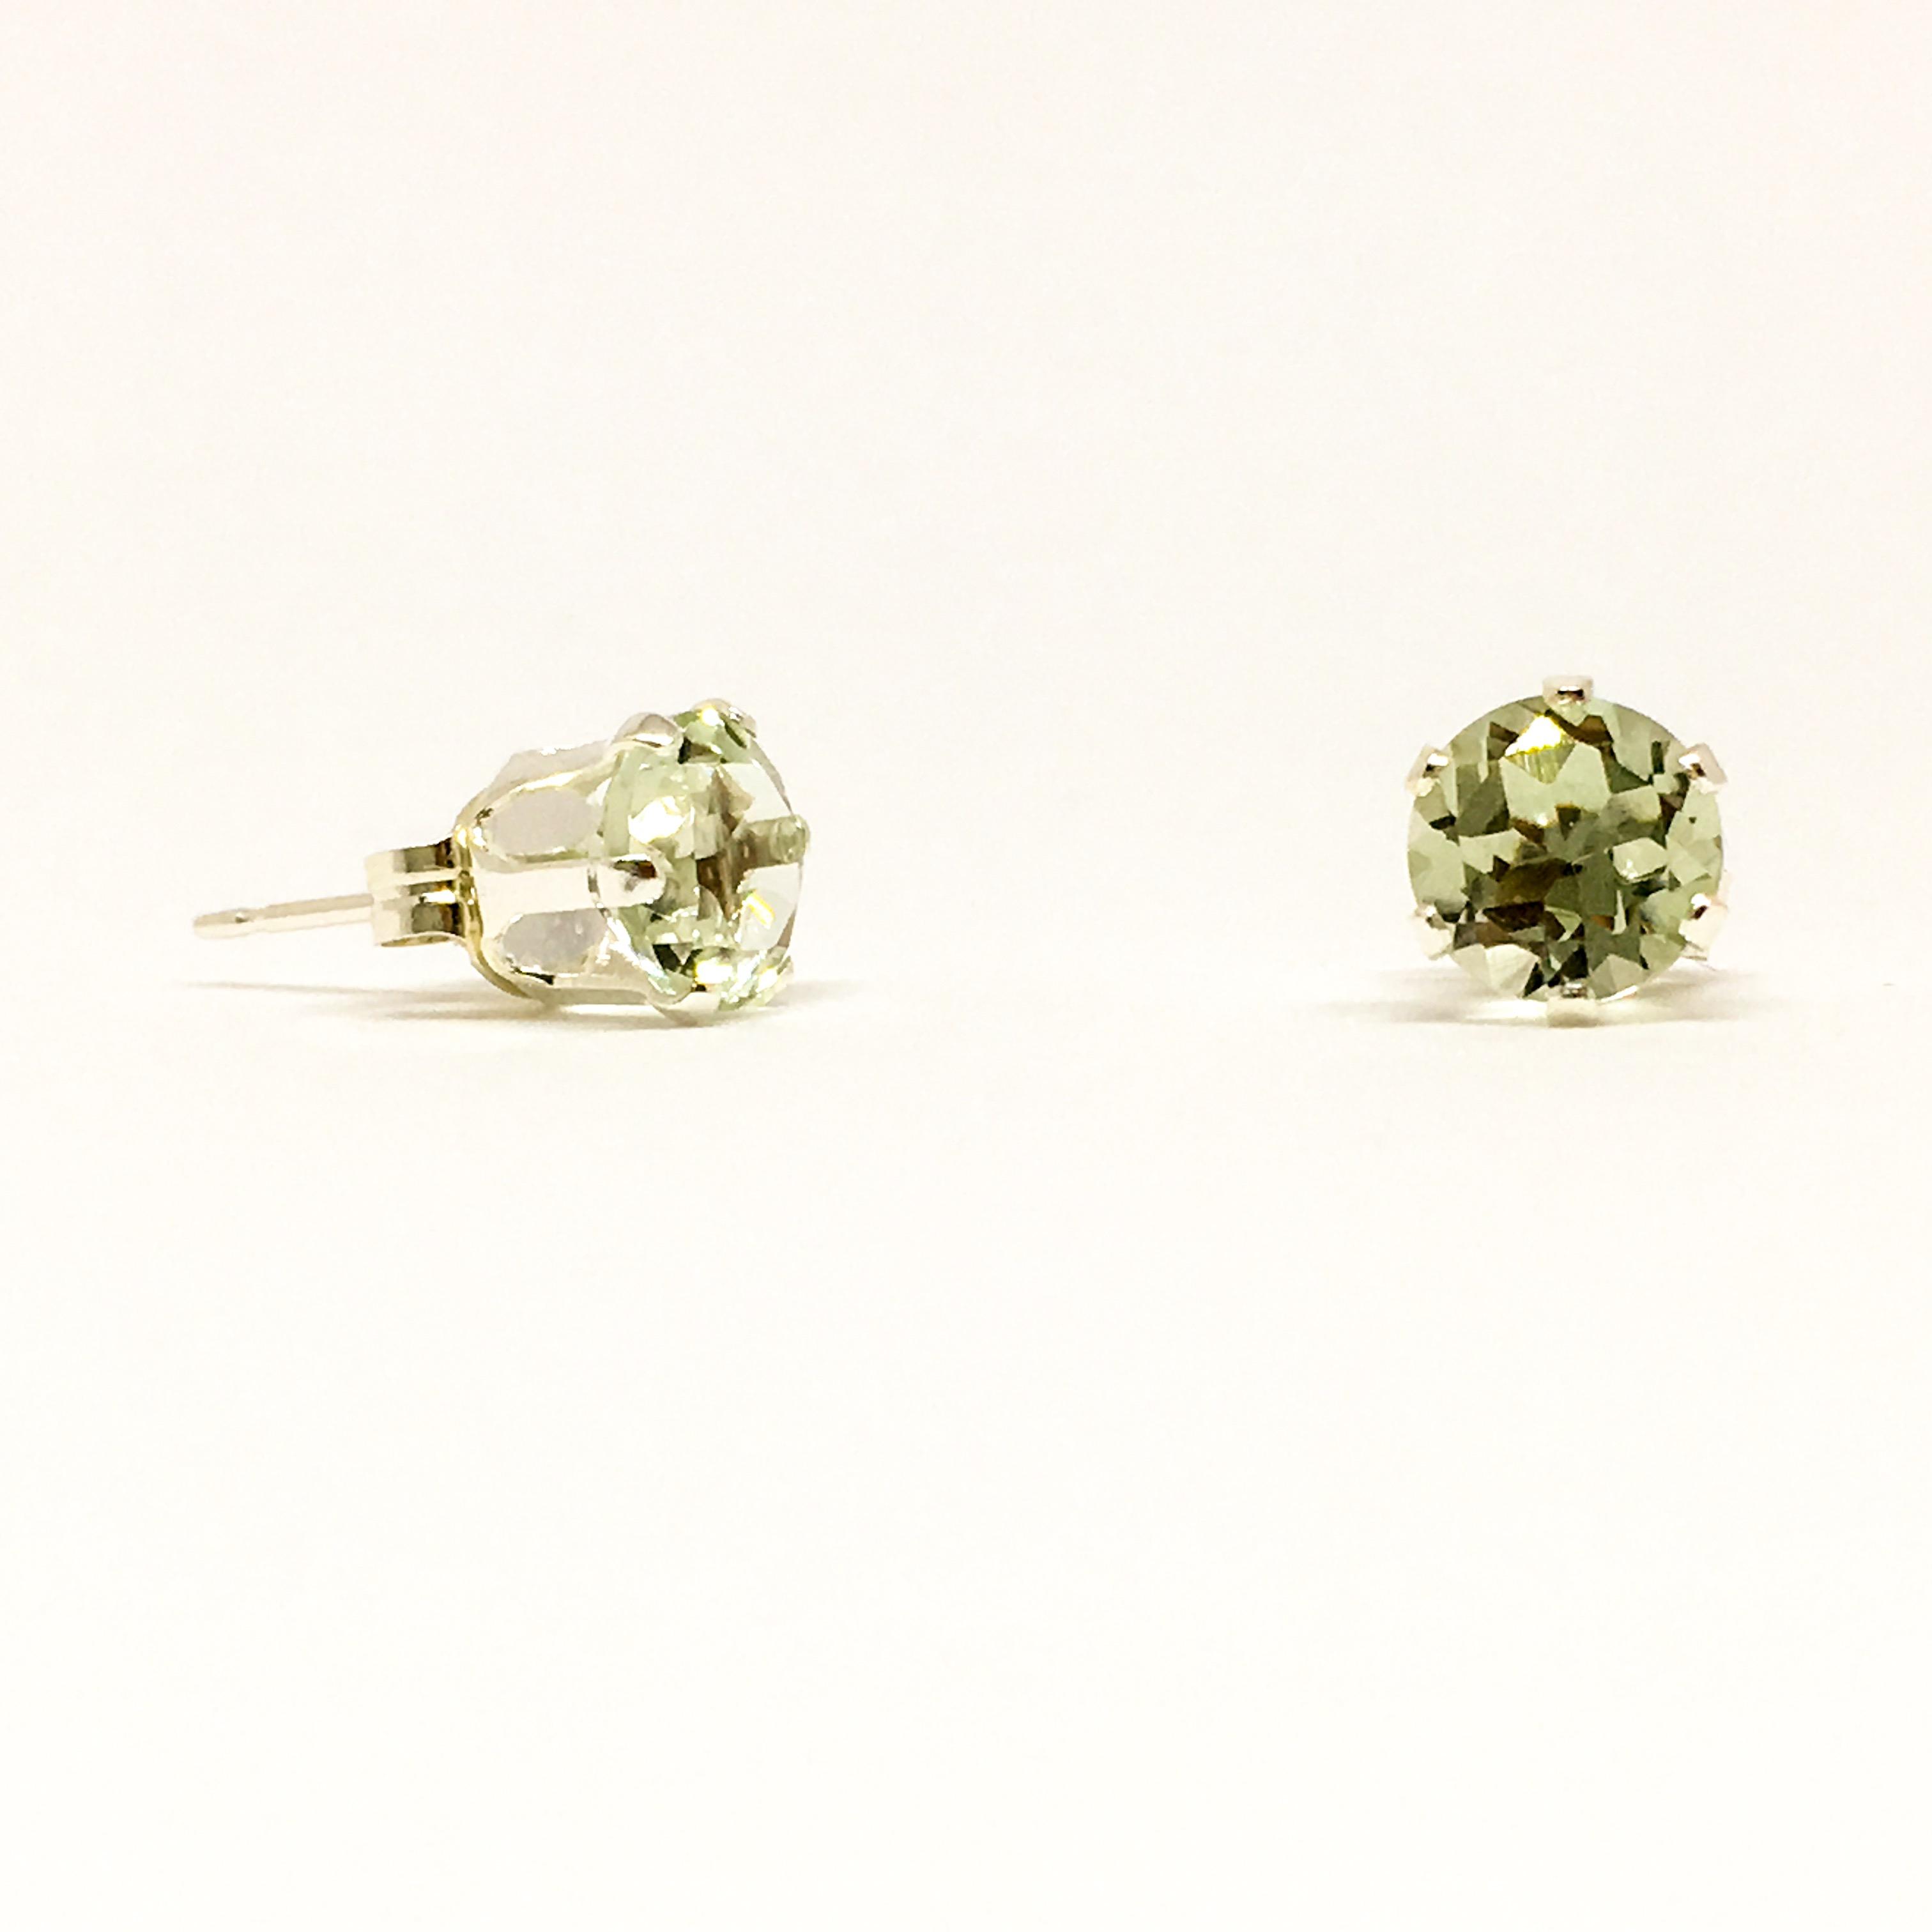 4mm Green Amethyst Gemstone Studs Sterling Silver Stud Earrings